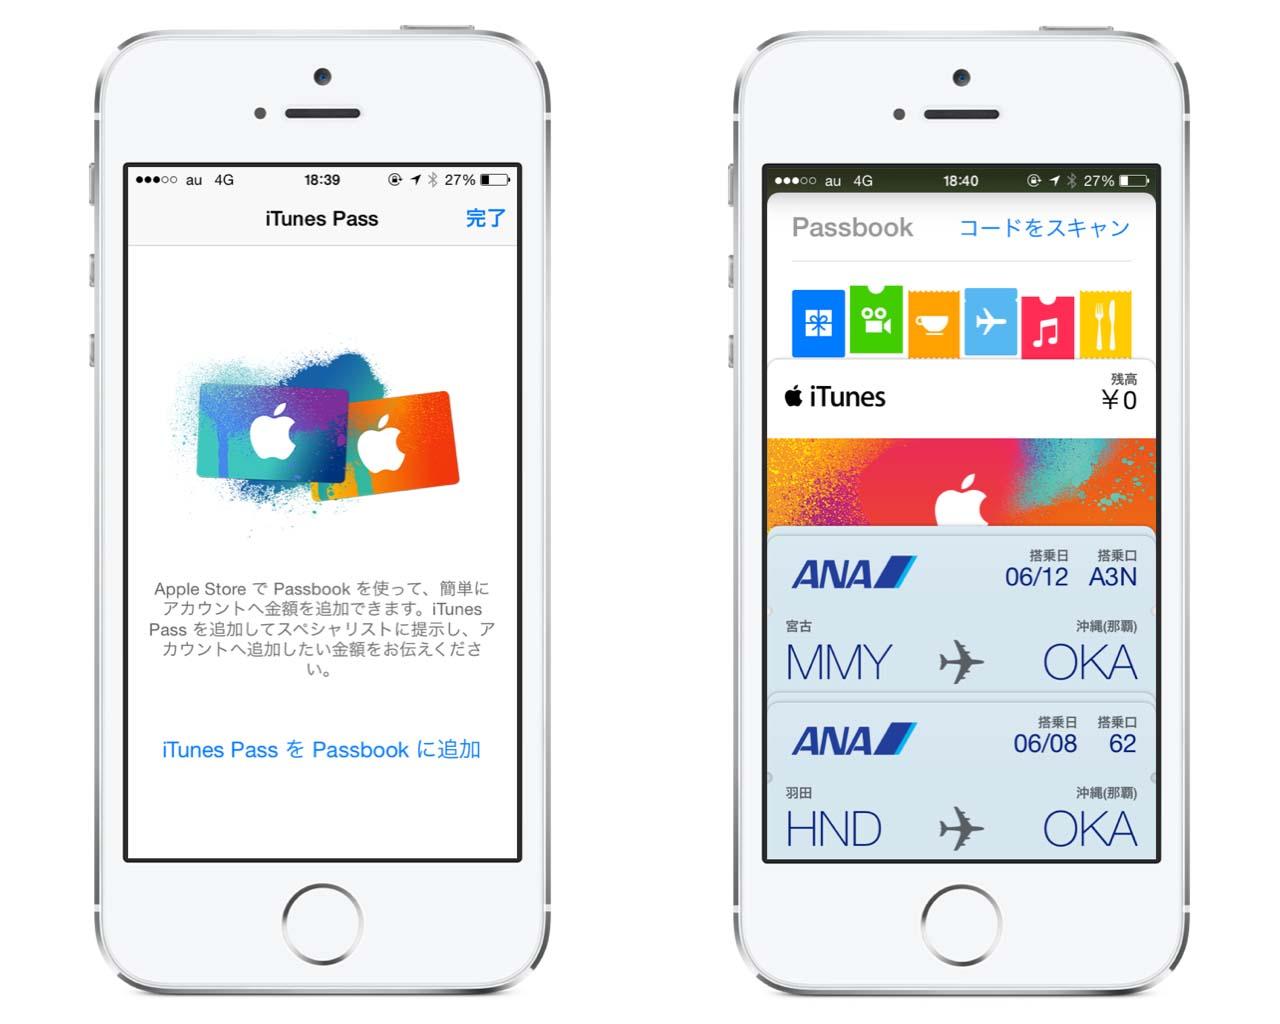 Apple、iTunes Passの提供を開始!今のところ日本だけで利用可能に